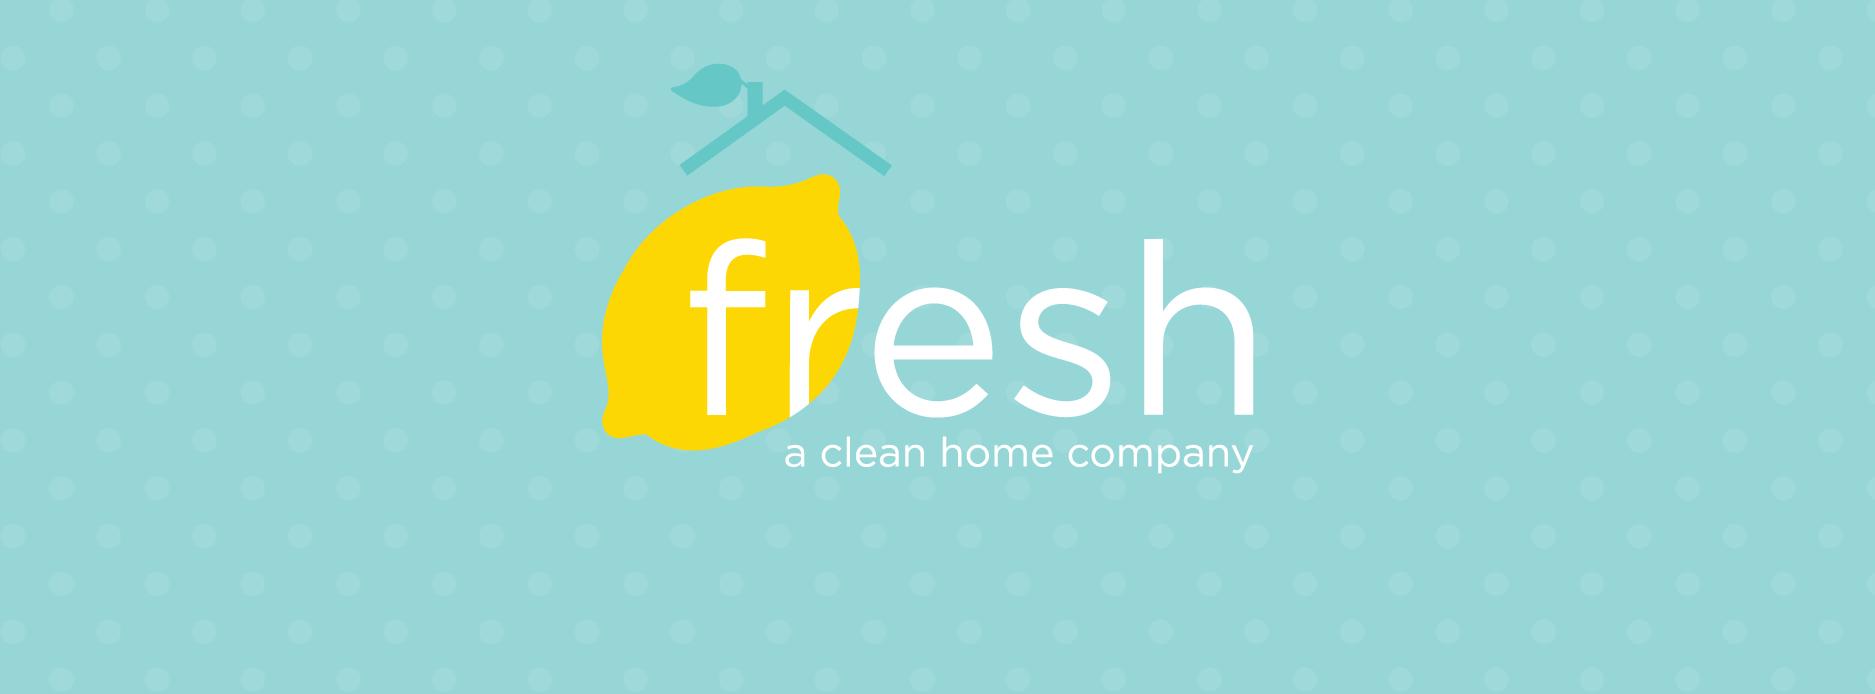 Fresh Home Company